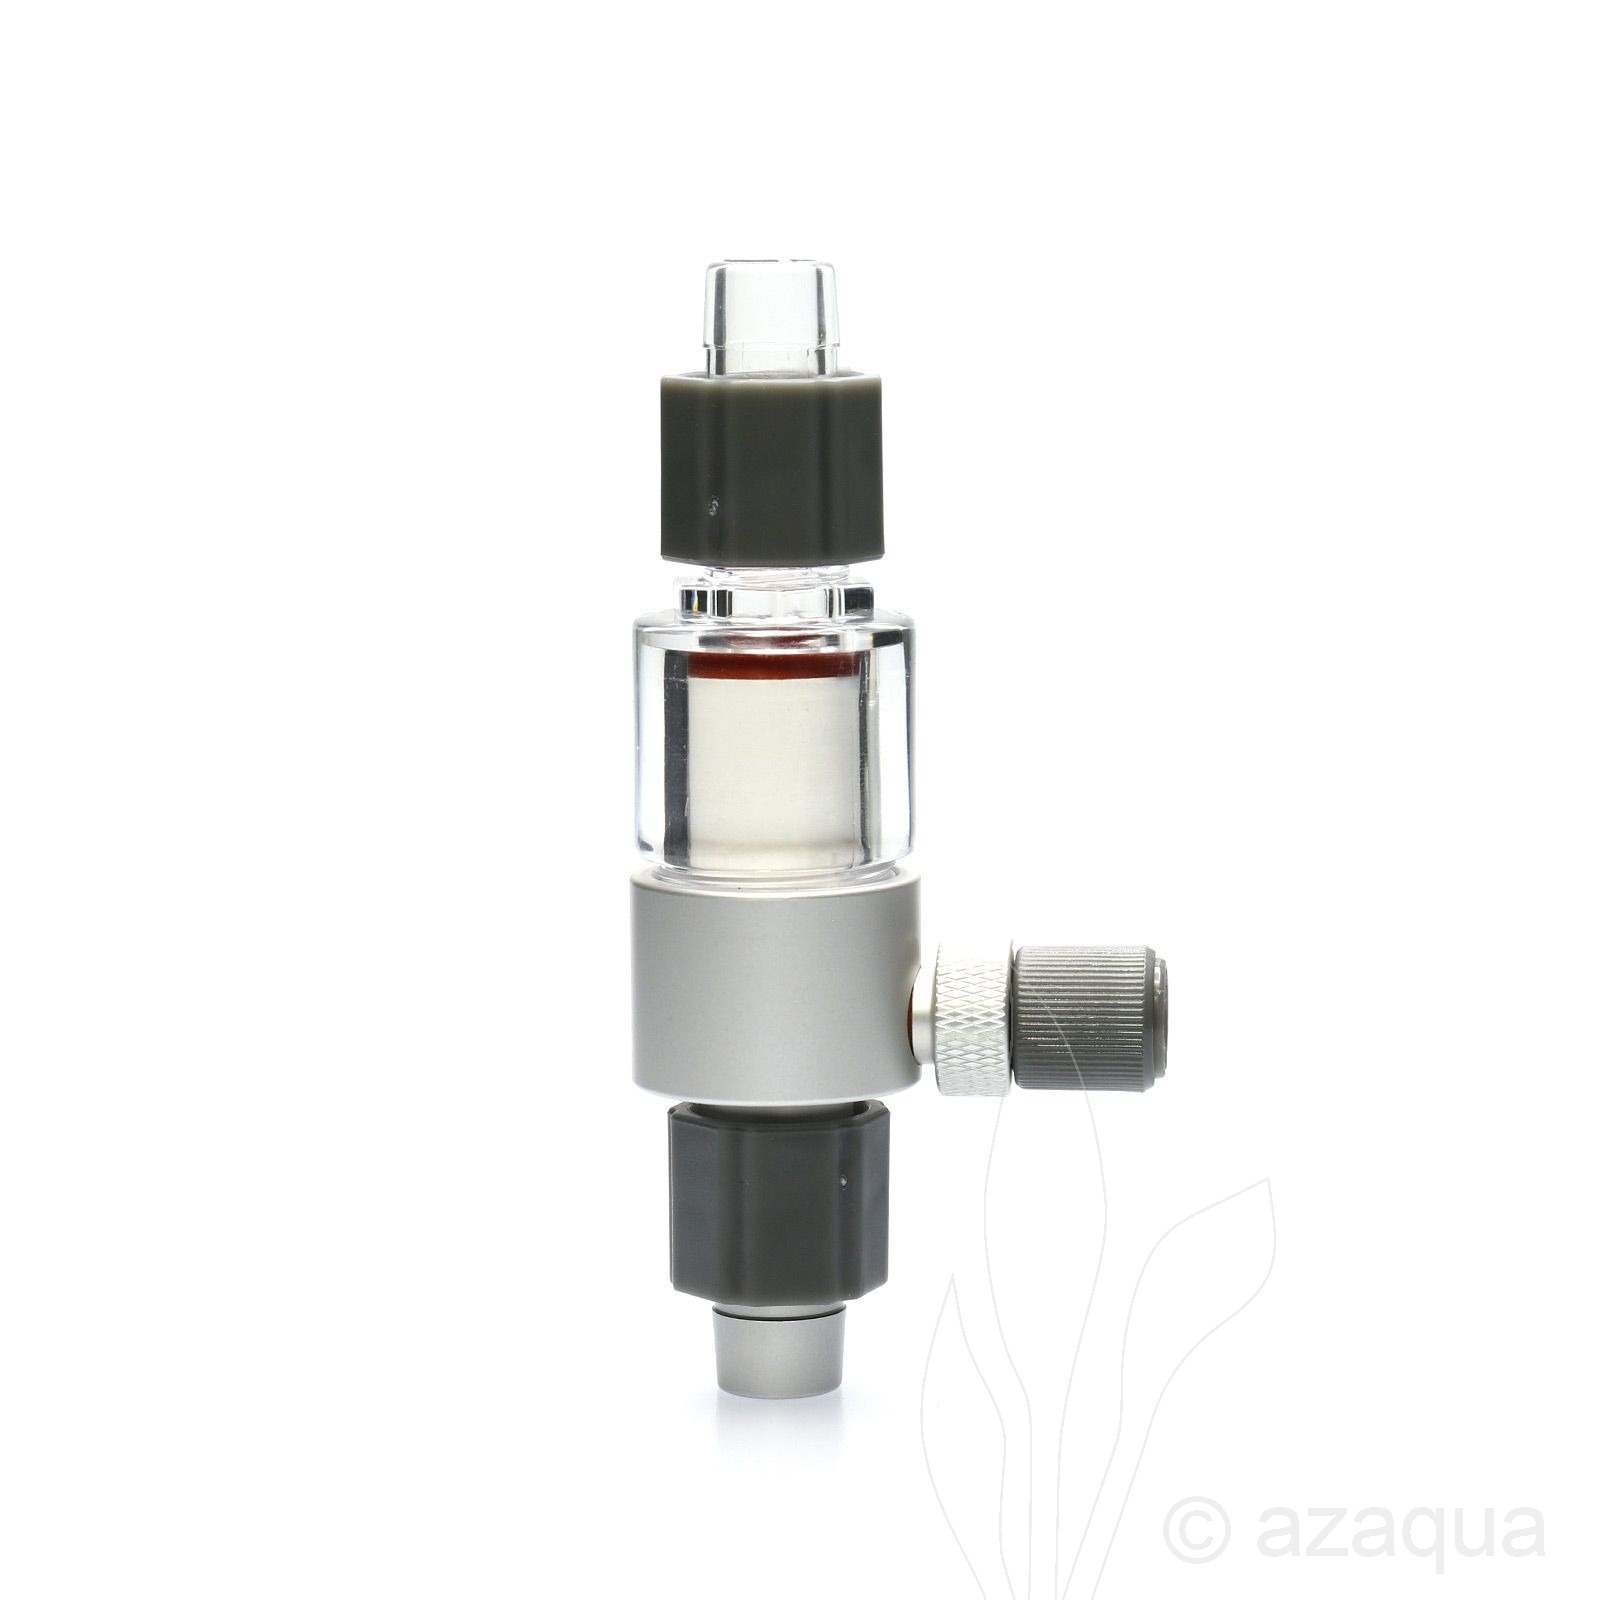 Inline CO2 atomizer